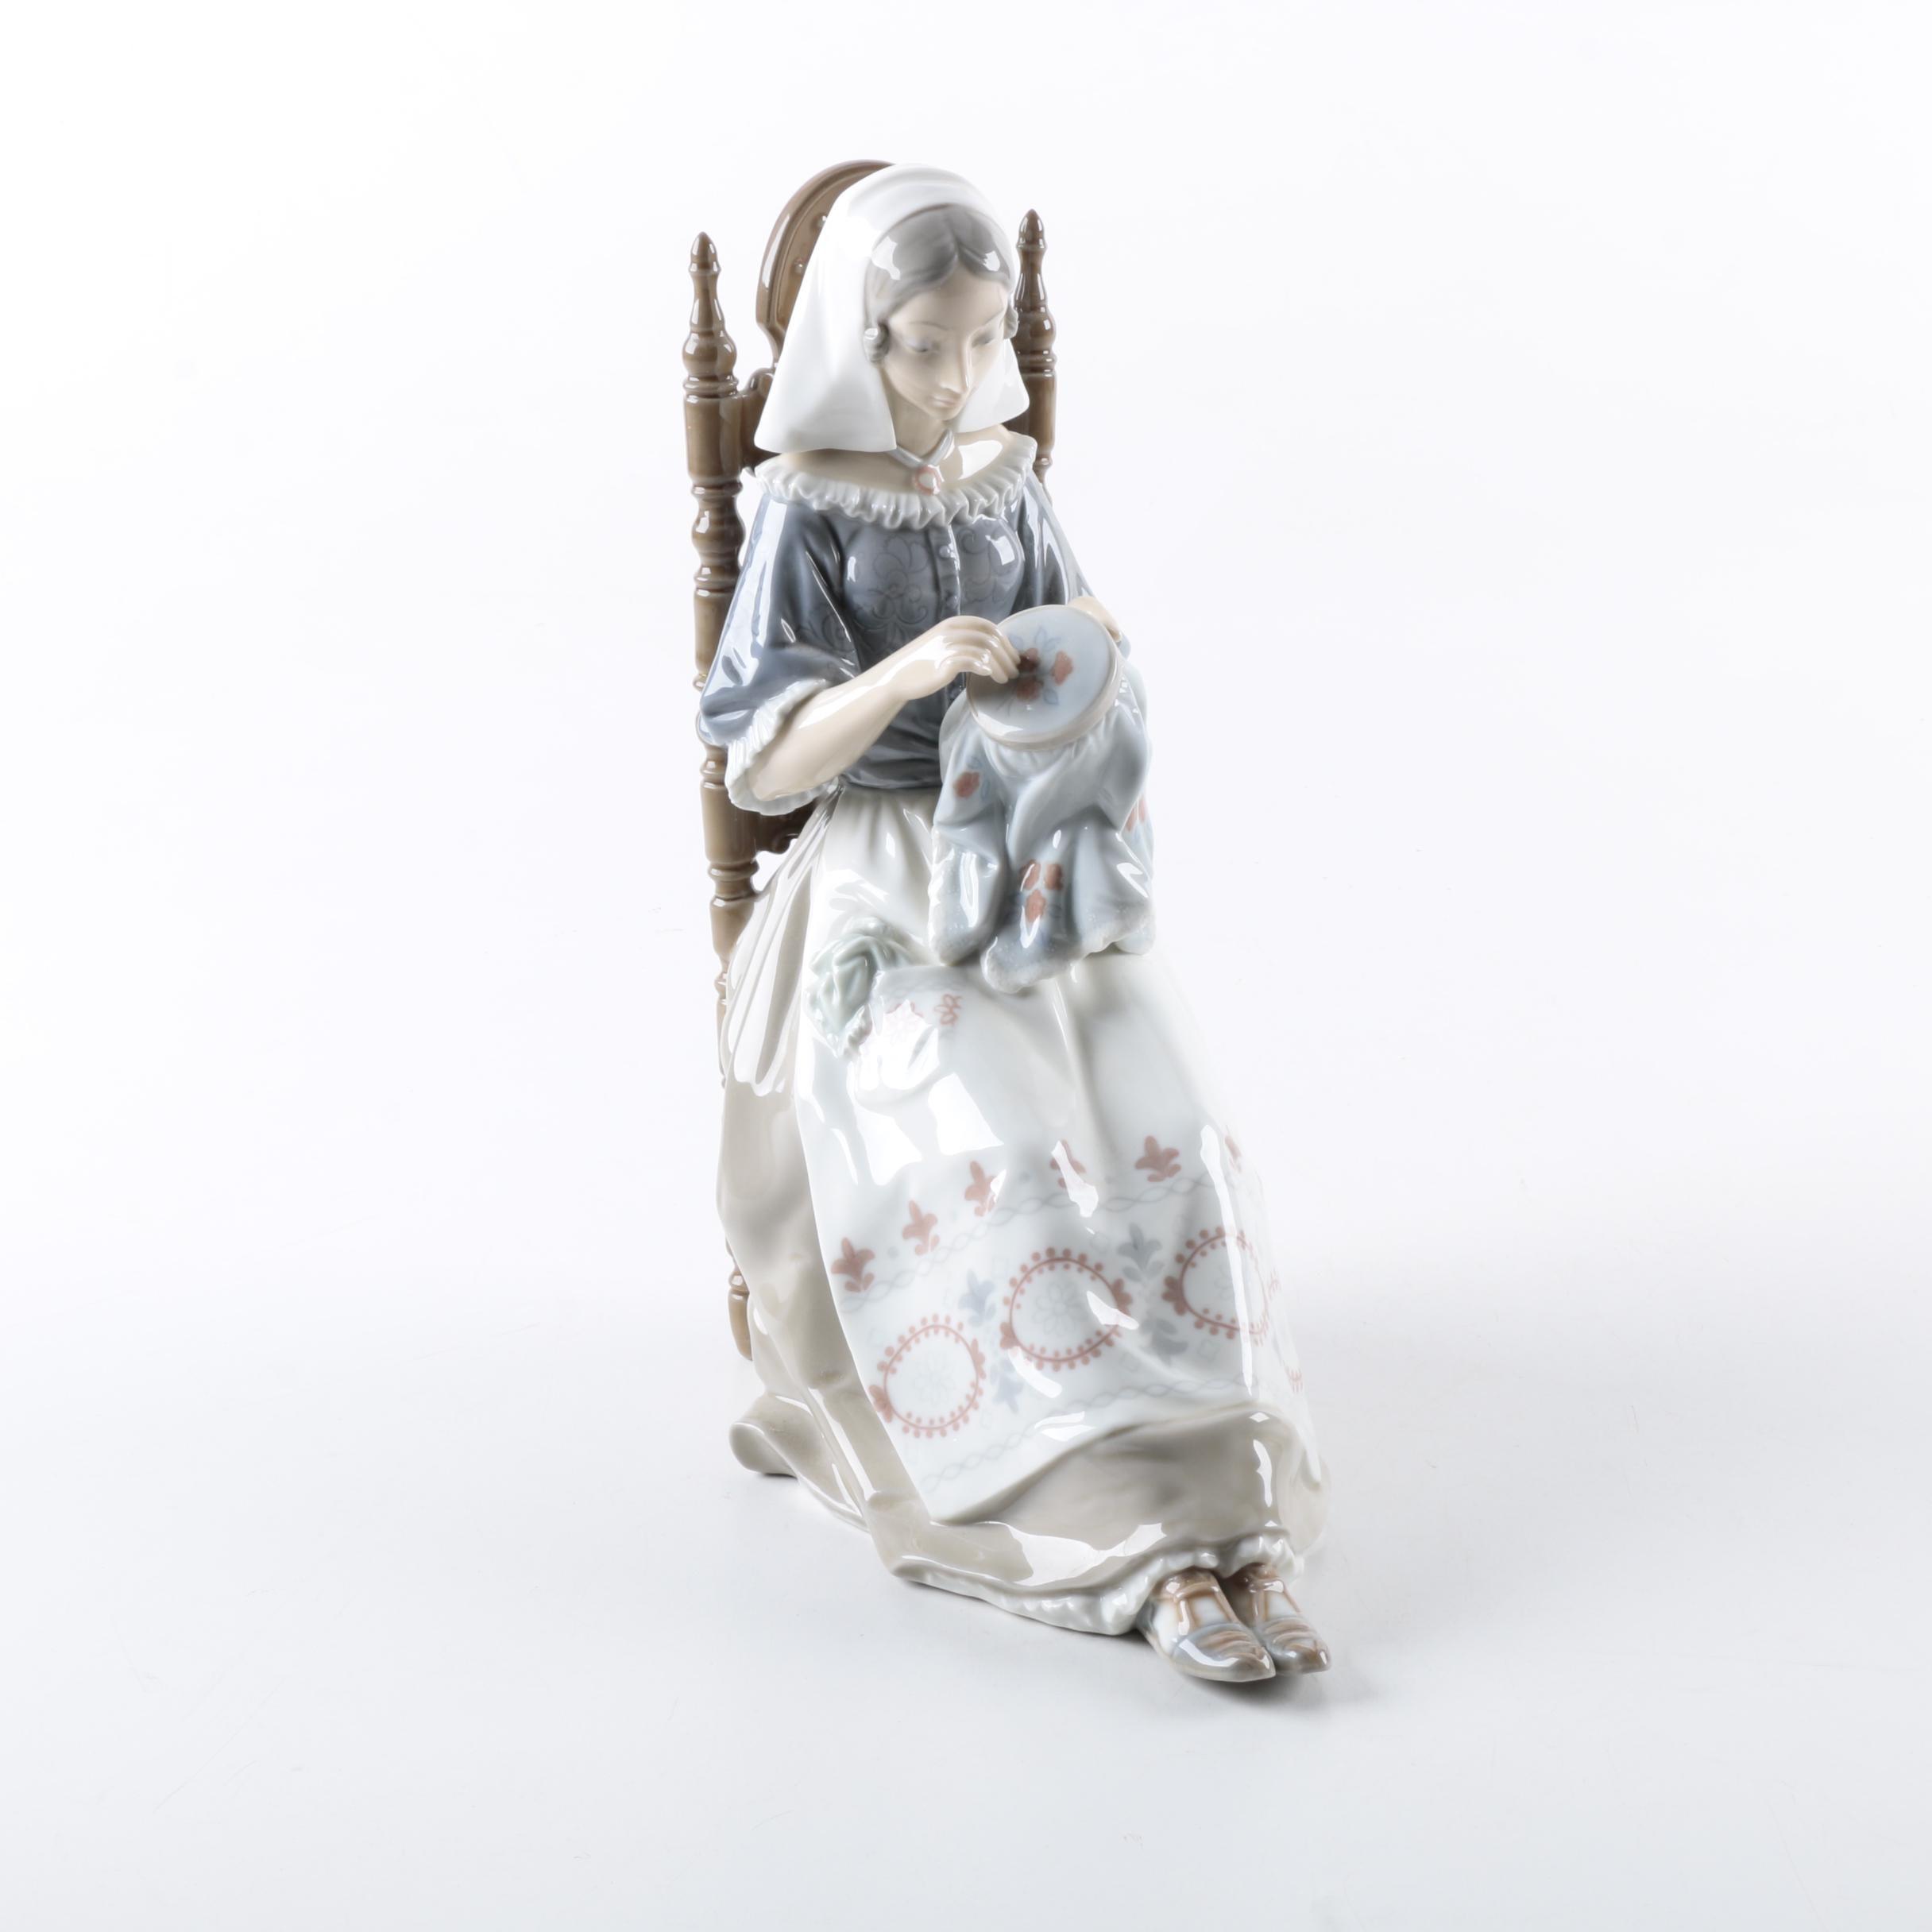 "A Lladró ""Insular Embroideress"" Figurine"